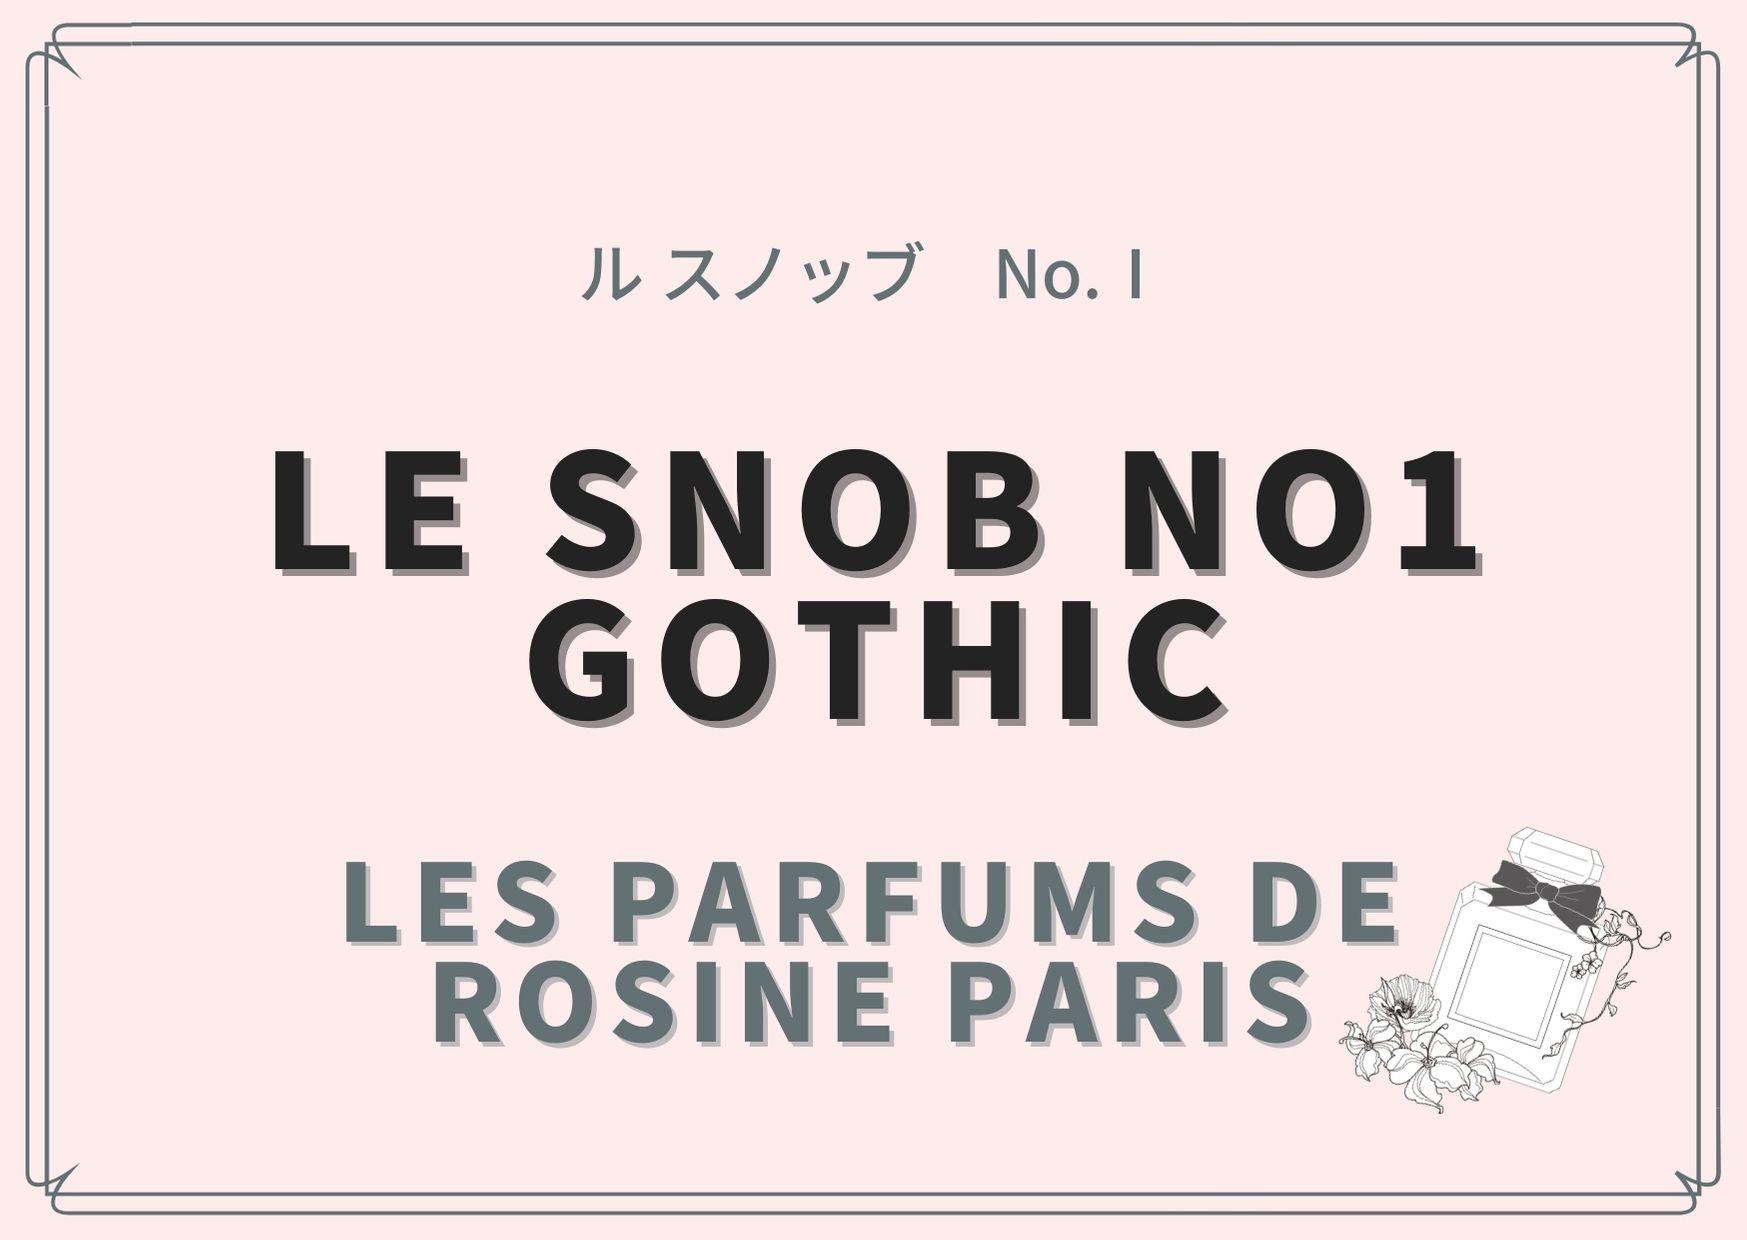 LE SNOB NO1 Gothic(ル スノッブ No.Ⅰ)/LES PARFUMS DE ROSINE PARIS(パルファン ロジーヌ パリ)